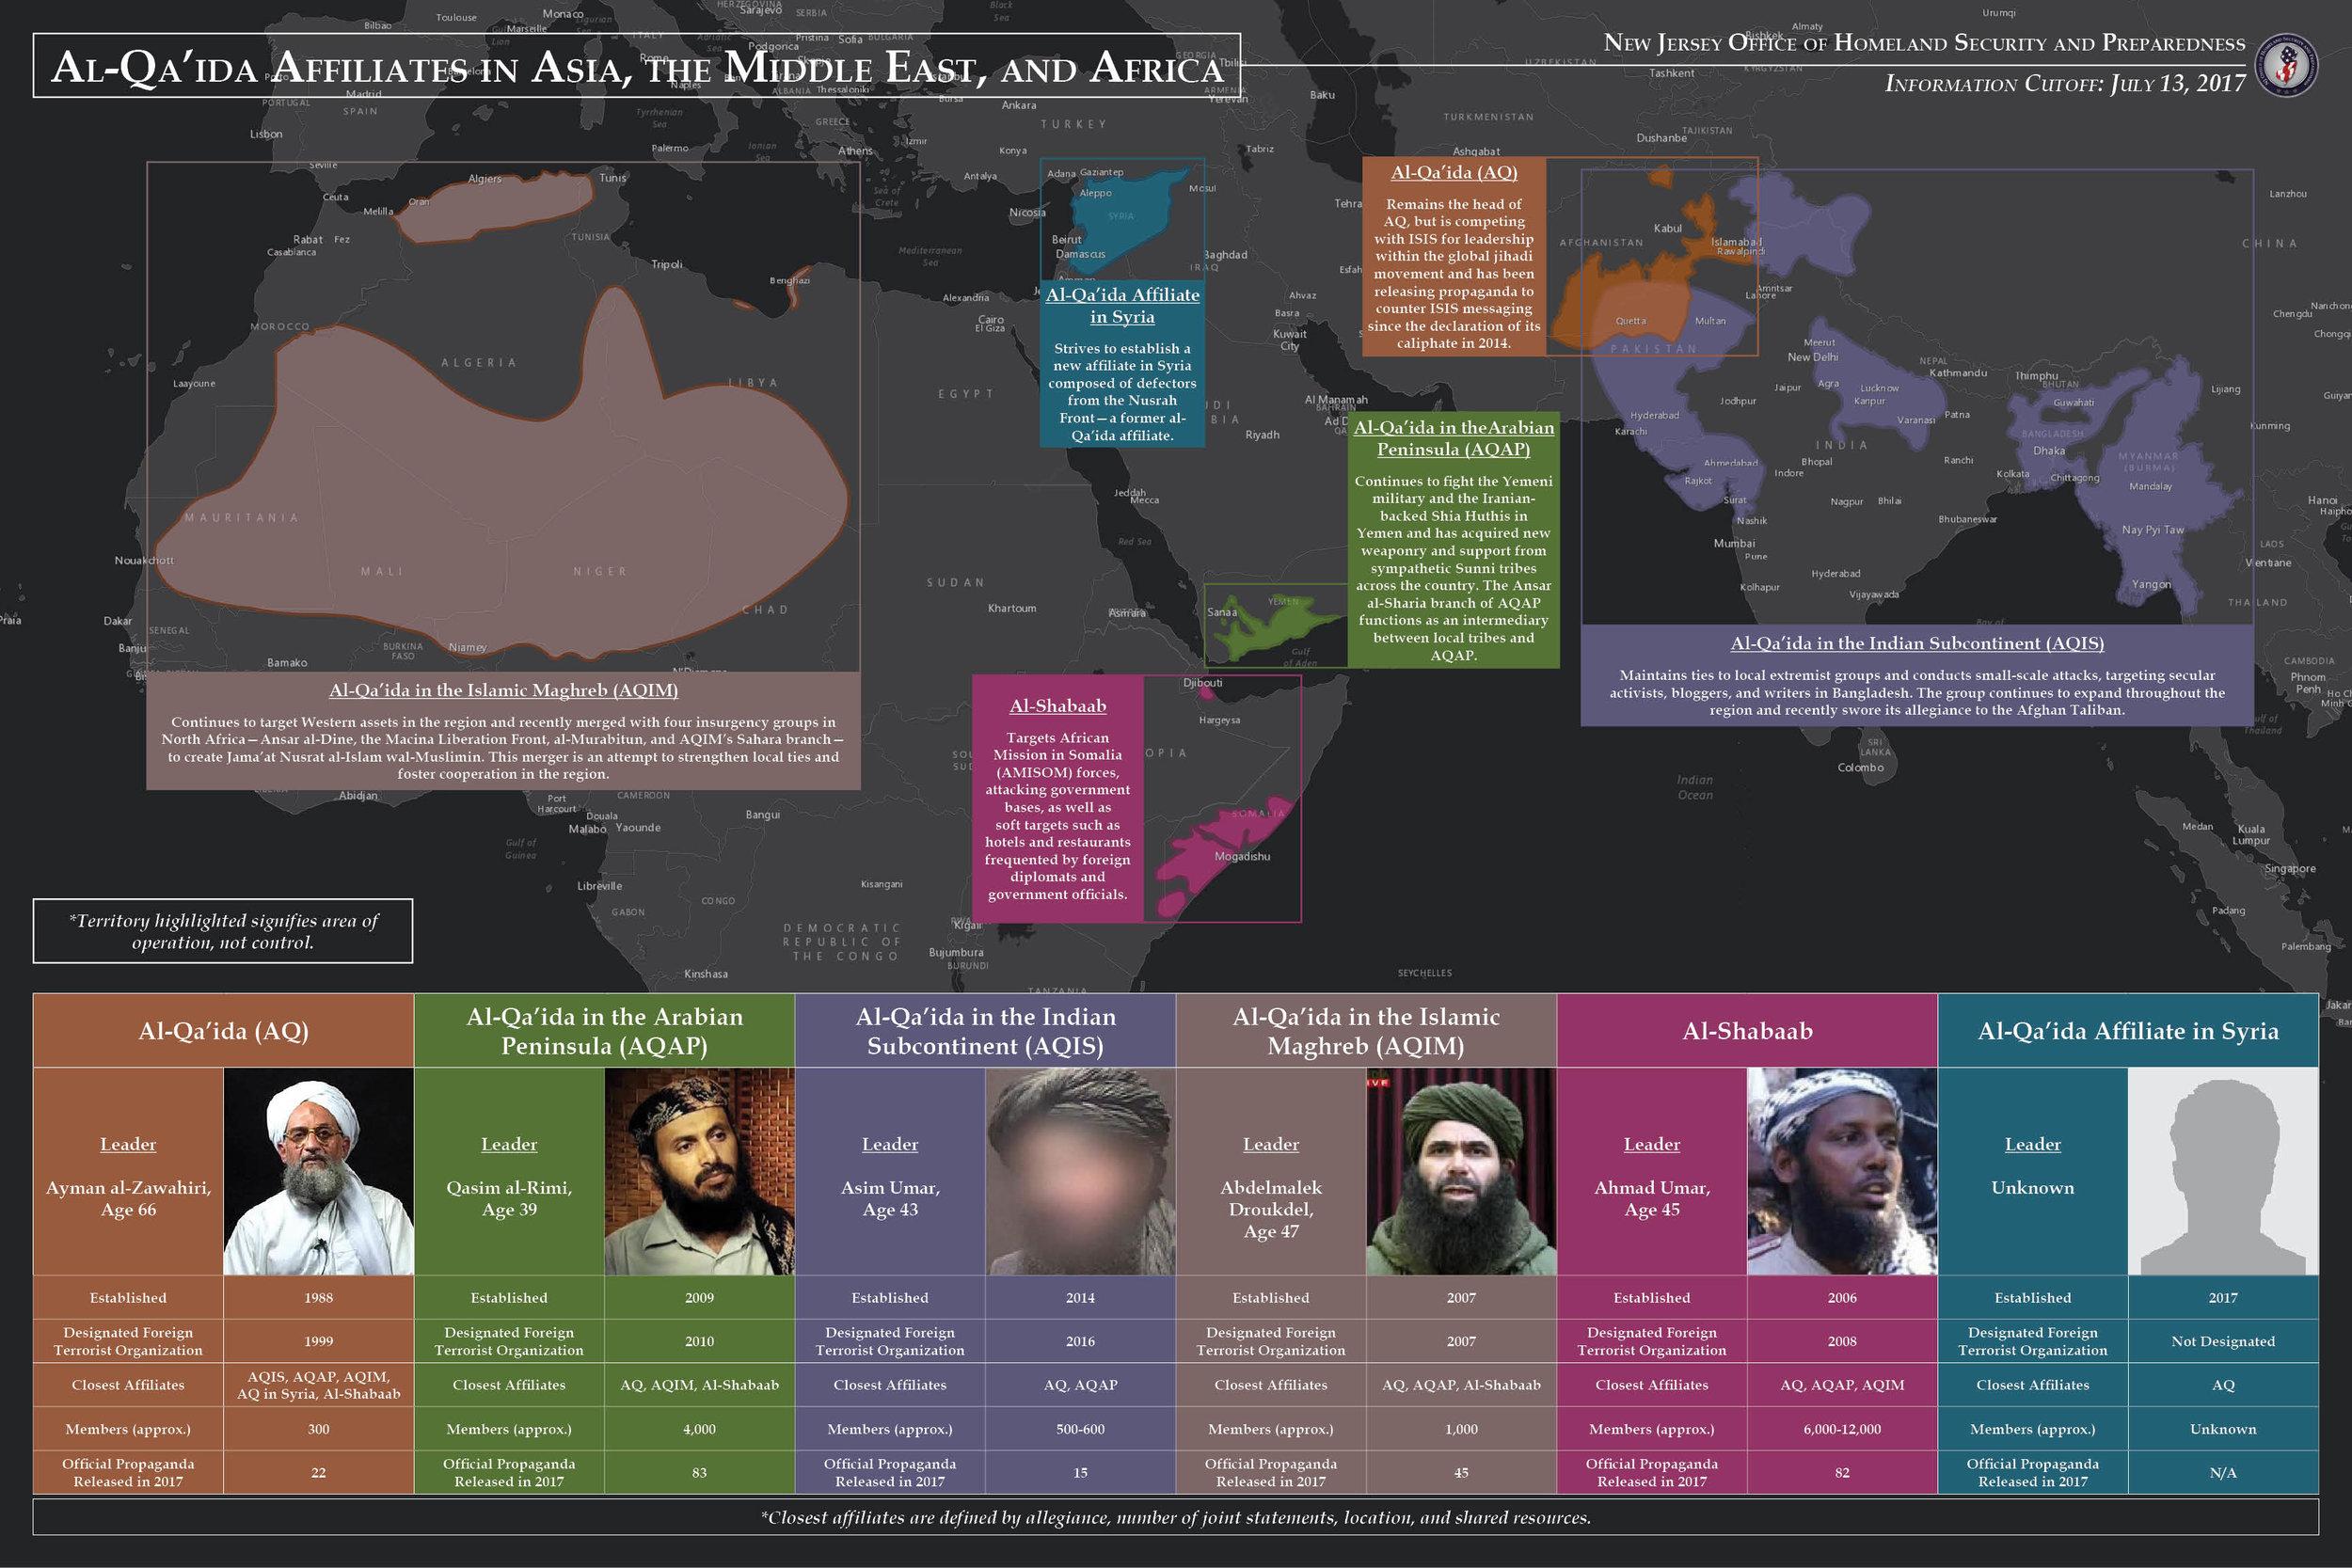 Al-Qa'ida Affiliates in Asia, the Middle East, and Africa website (7.19.17) v4.jpg